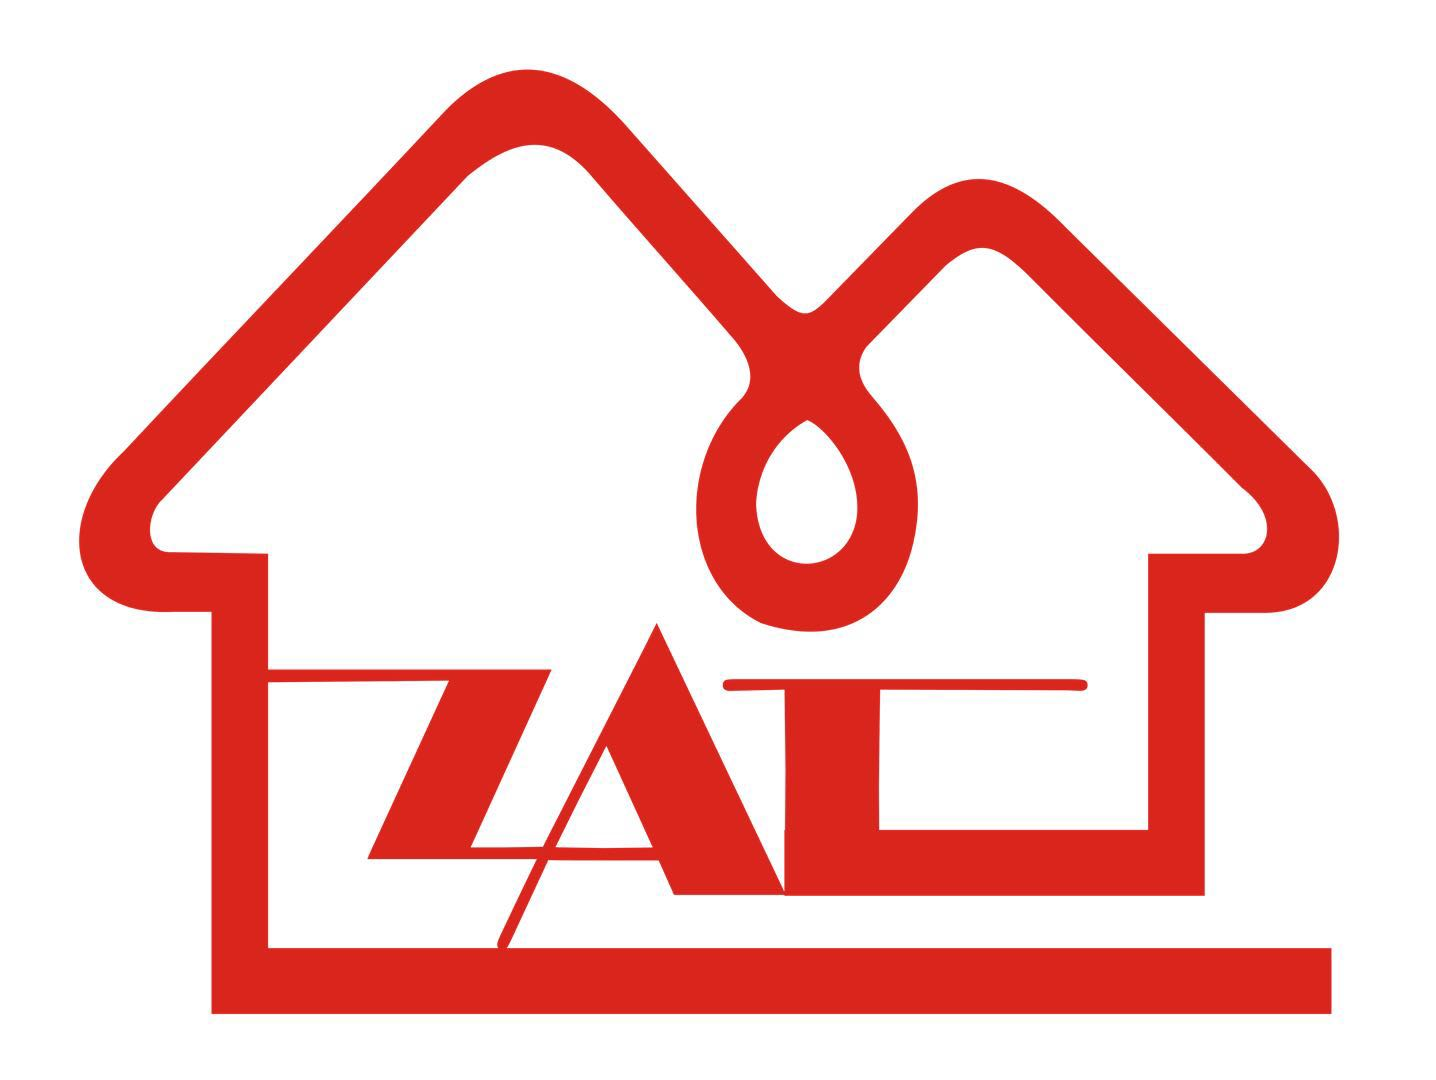 logo logo 标识 标志 设计 矢量 矢量图 素材 图标 1436_1080